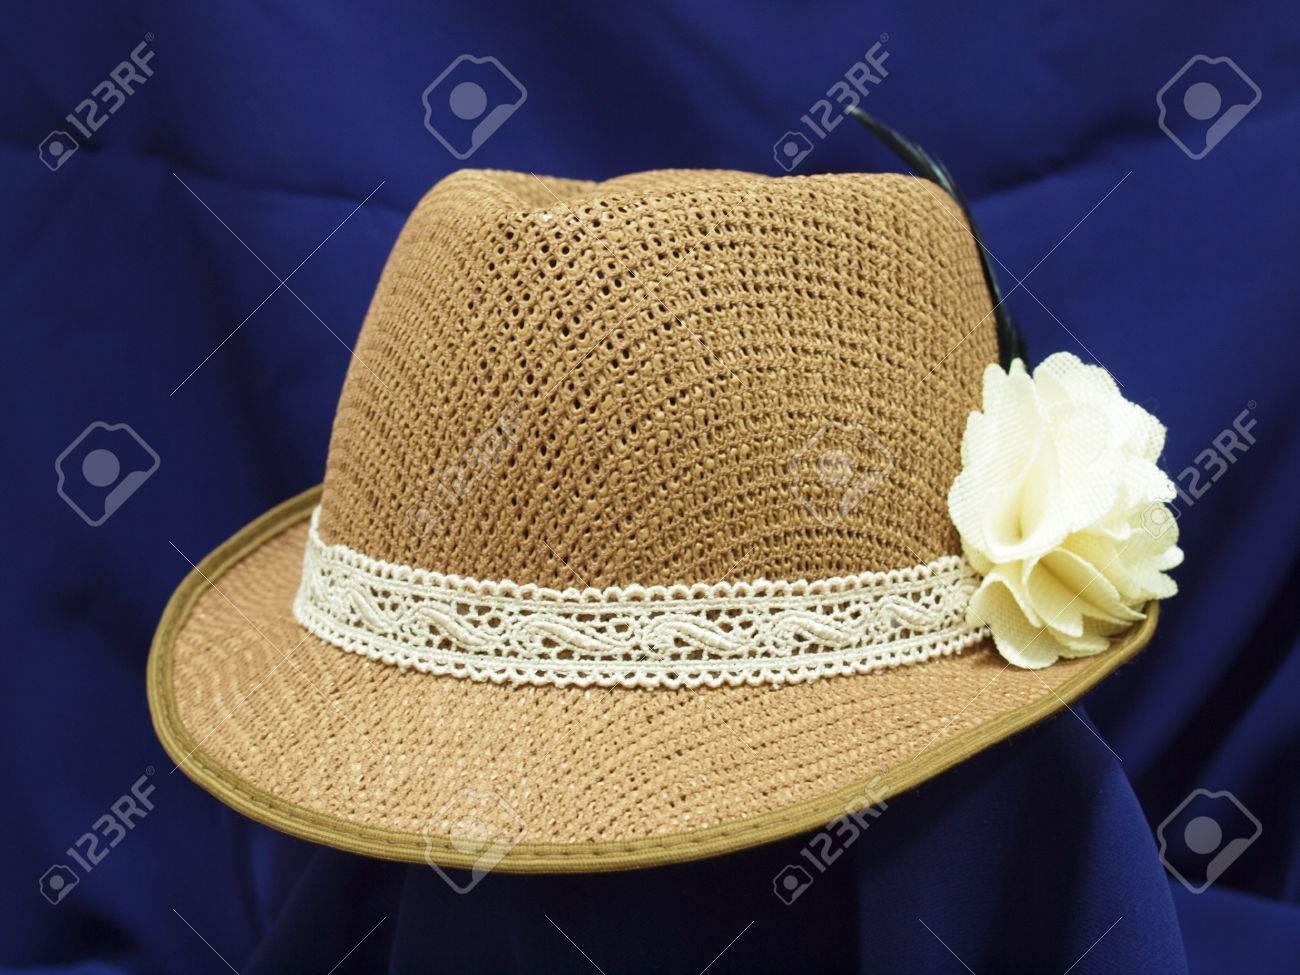 9145d246c Decorated Cowboy Hats